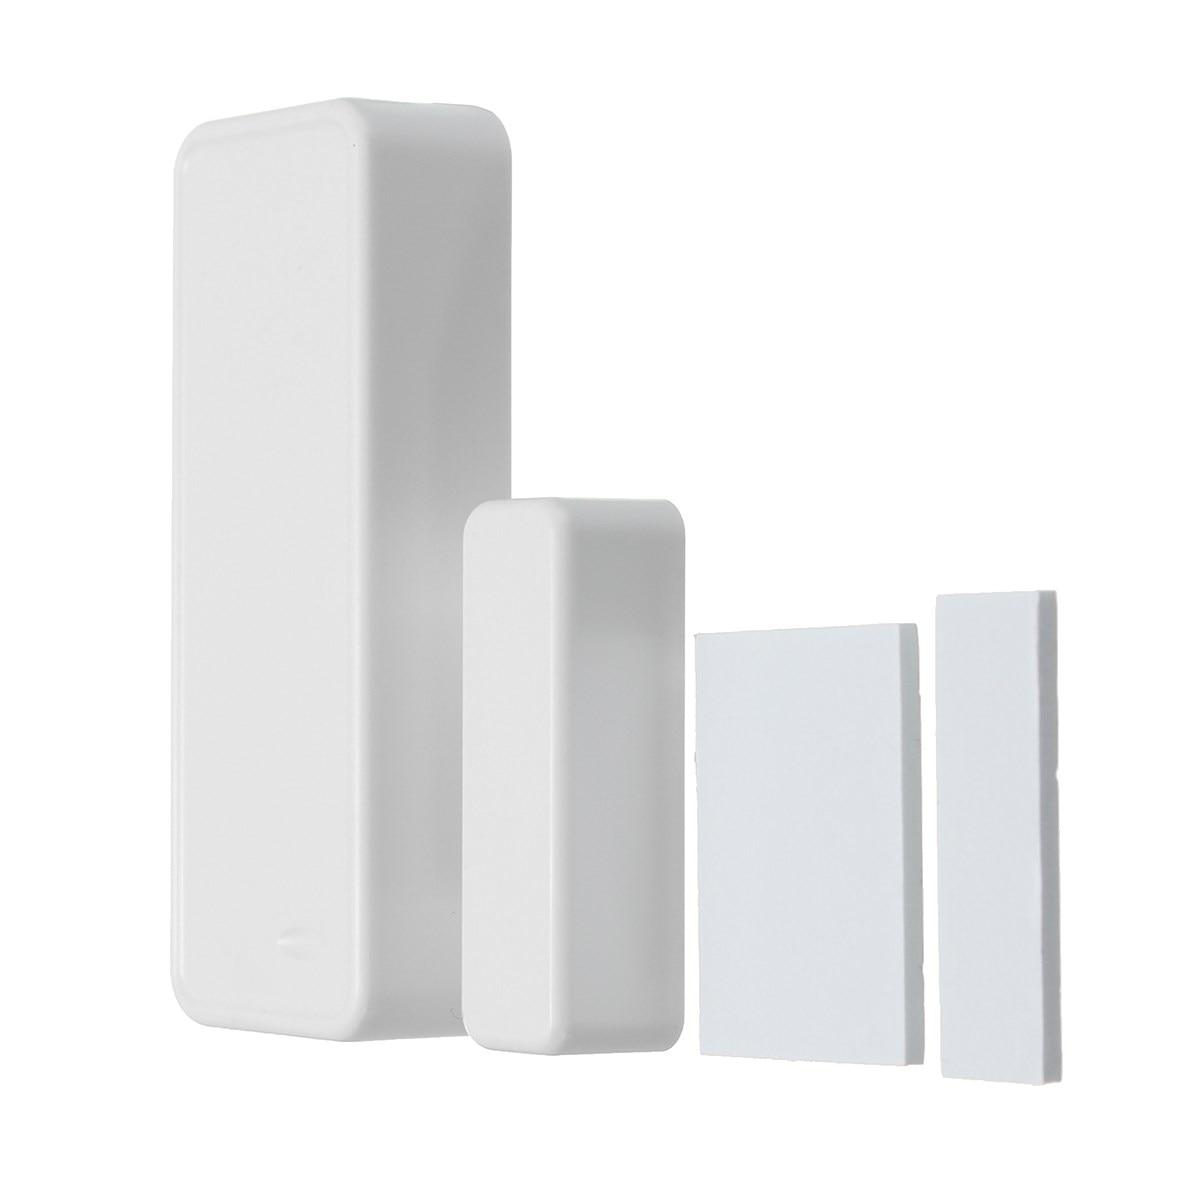 NEW Safurance Wireless Alarm Sensors Accessories For G90B PLUS WiFi GSM Home Alarm System Door Sensor leveling sensor yg 128 lehy hope optoelectronics magnetic sensors sleeve new